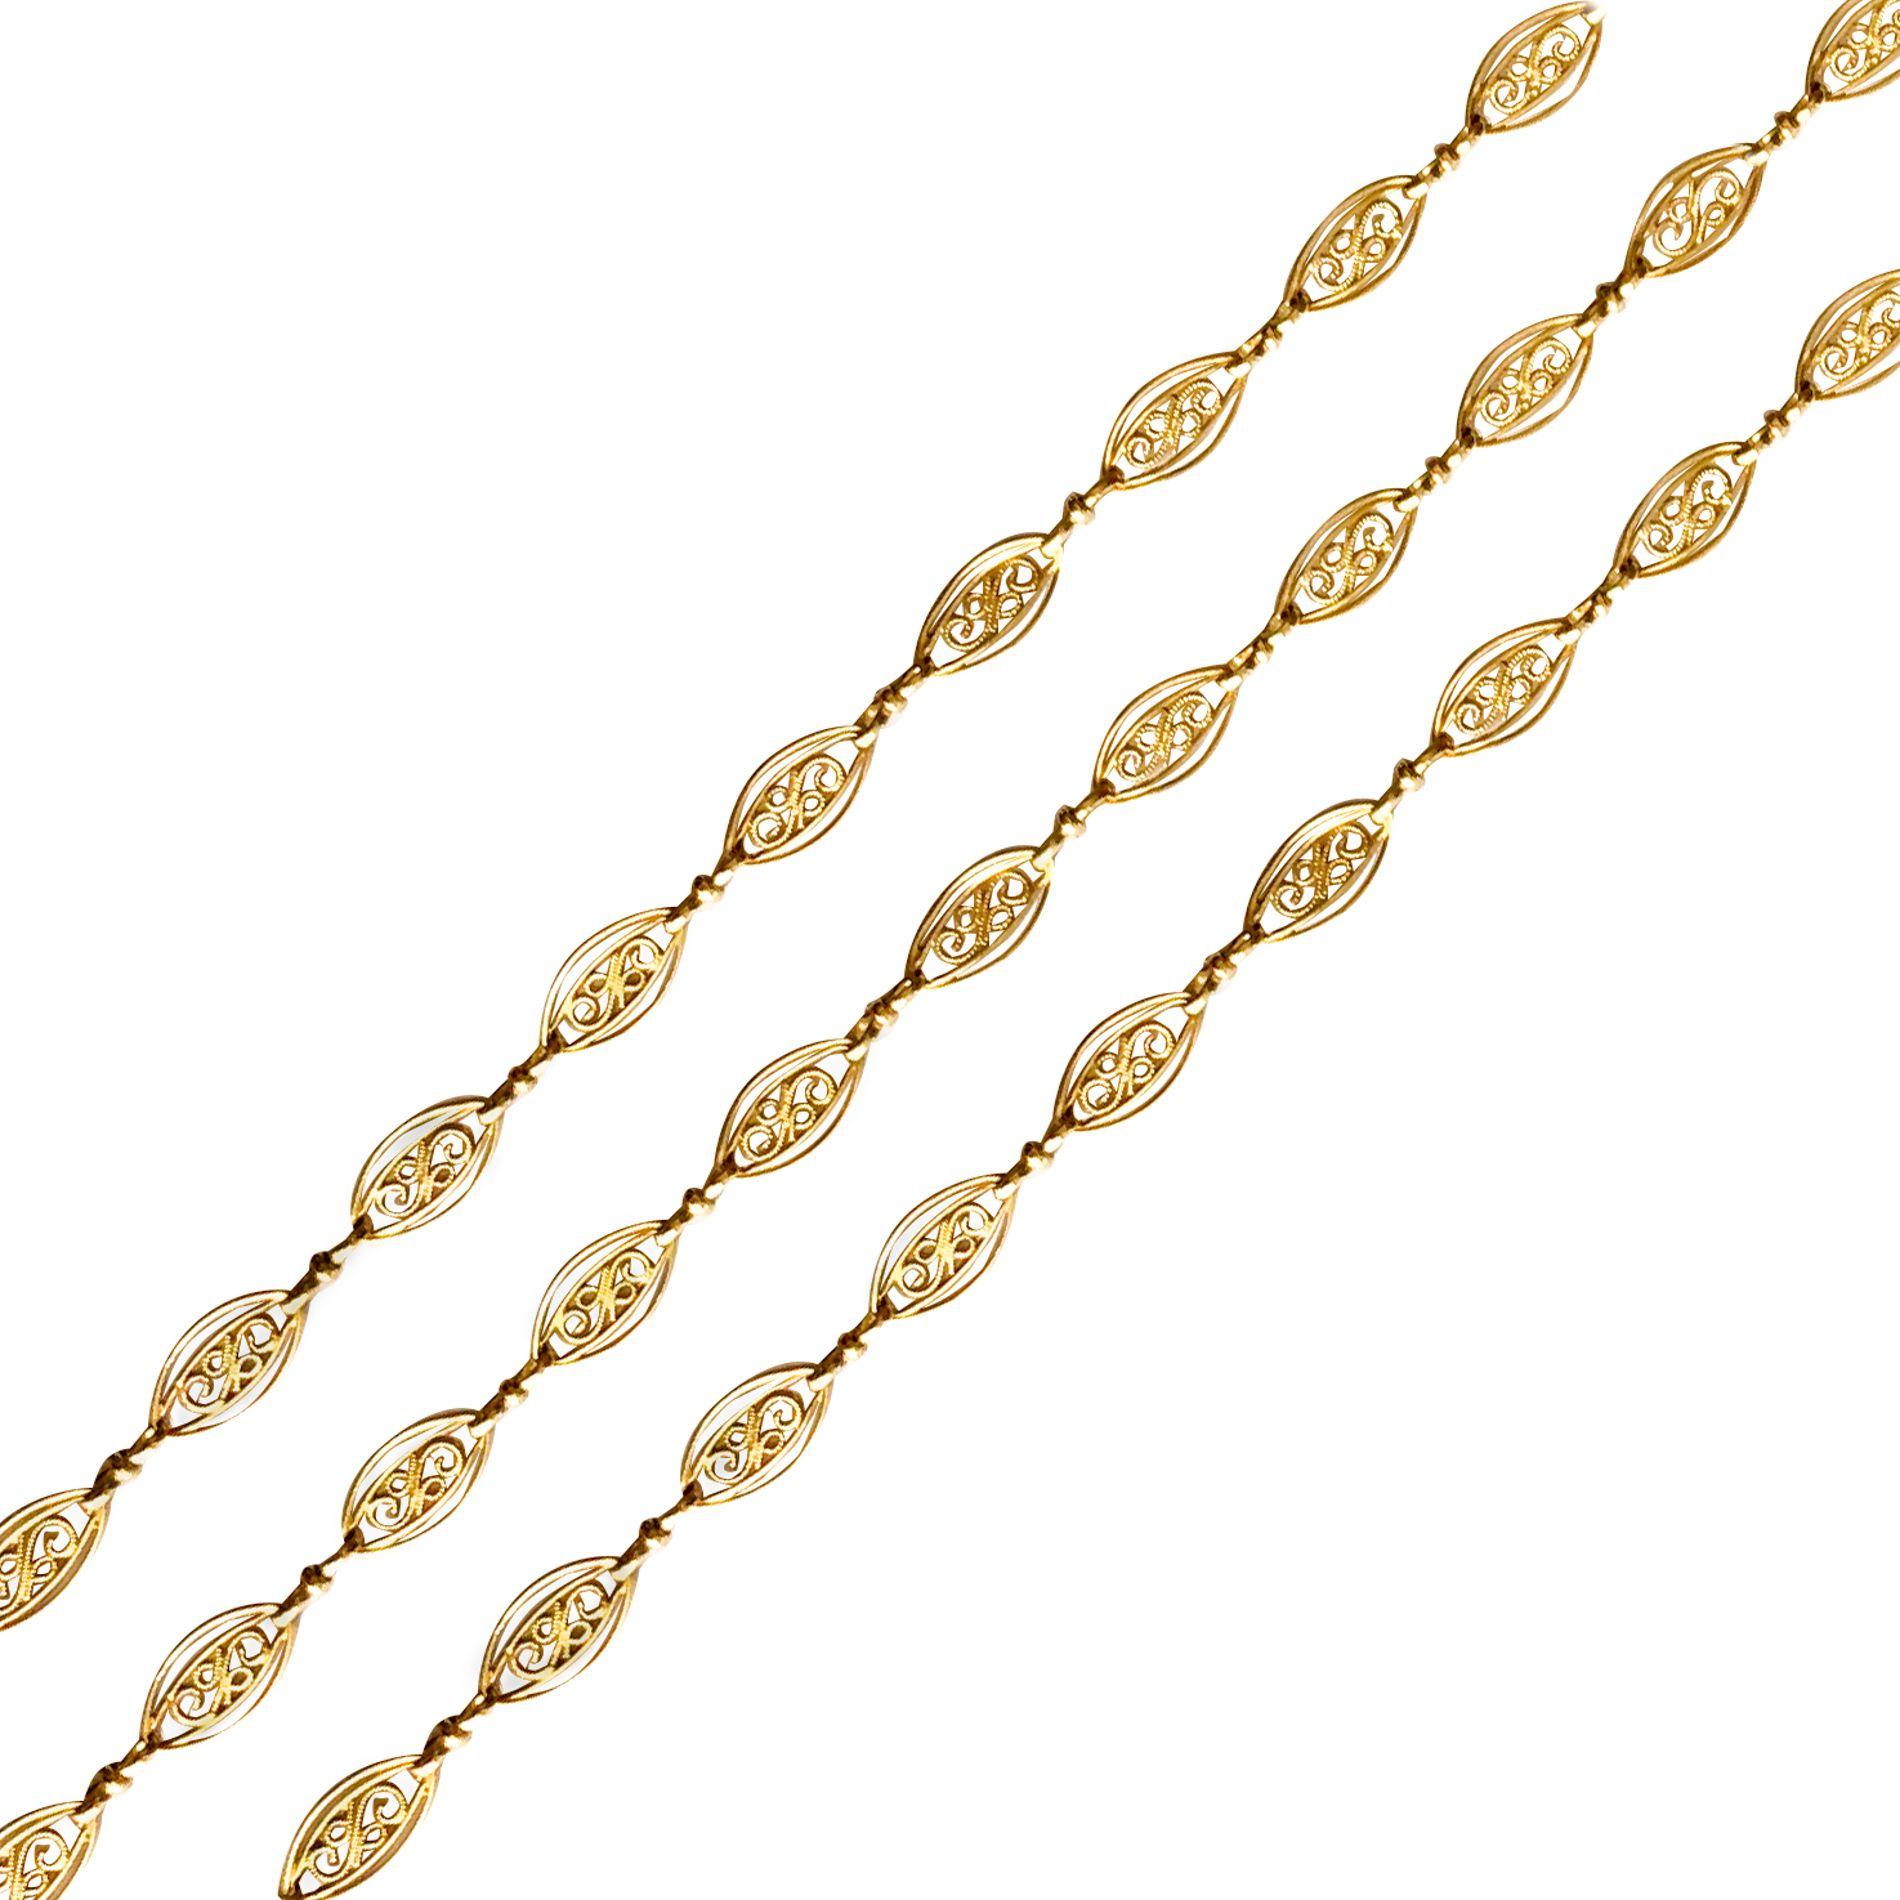 Chaine ancienne sautoir or jaune filigranes